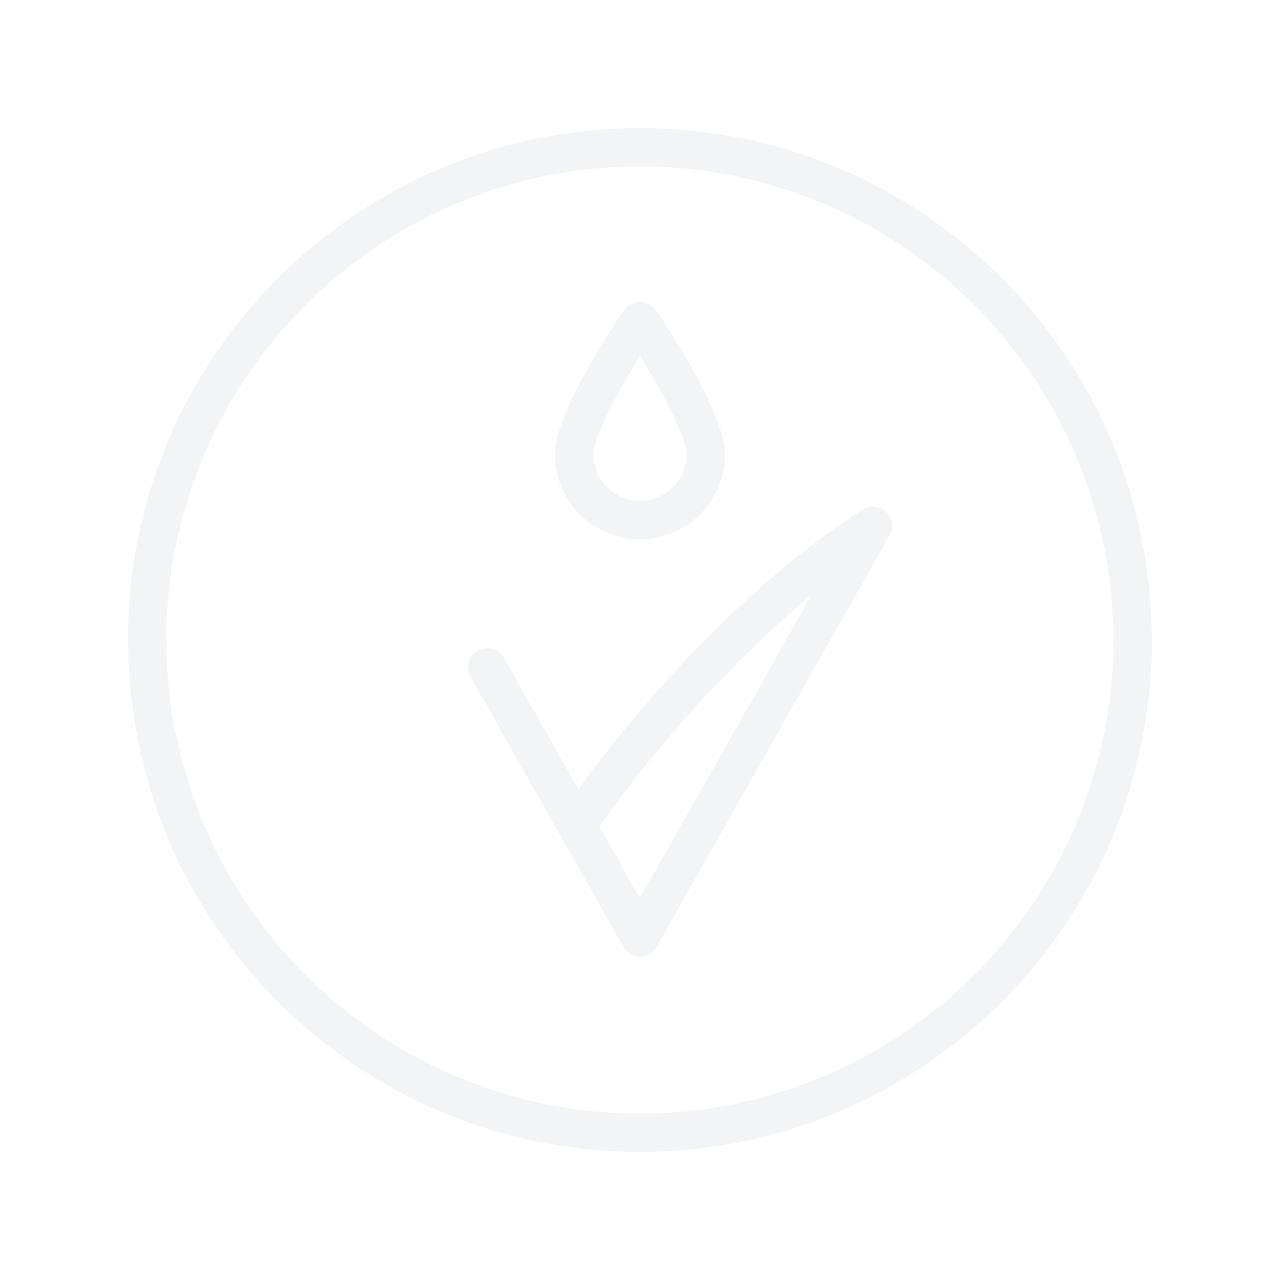 Maybelline Affinitone Powder No.03 Light Sand Beige 9g